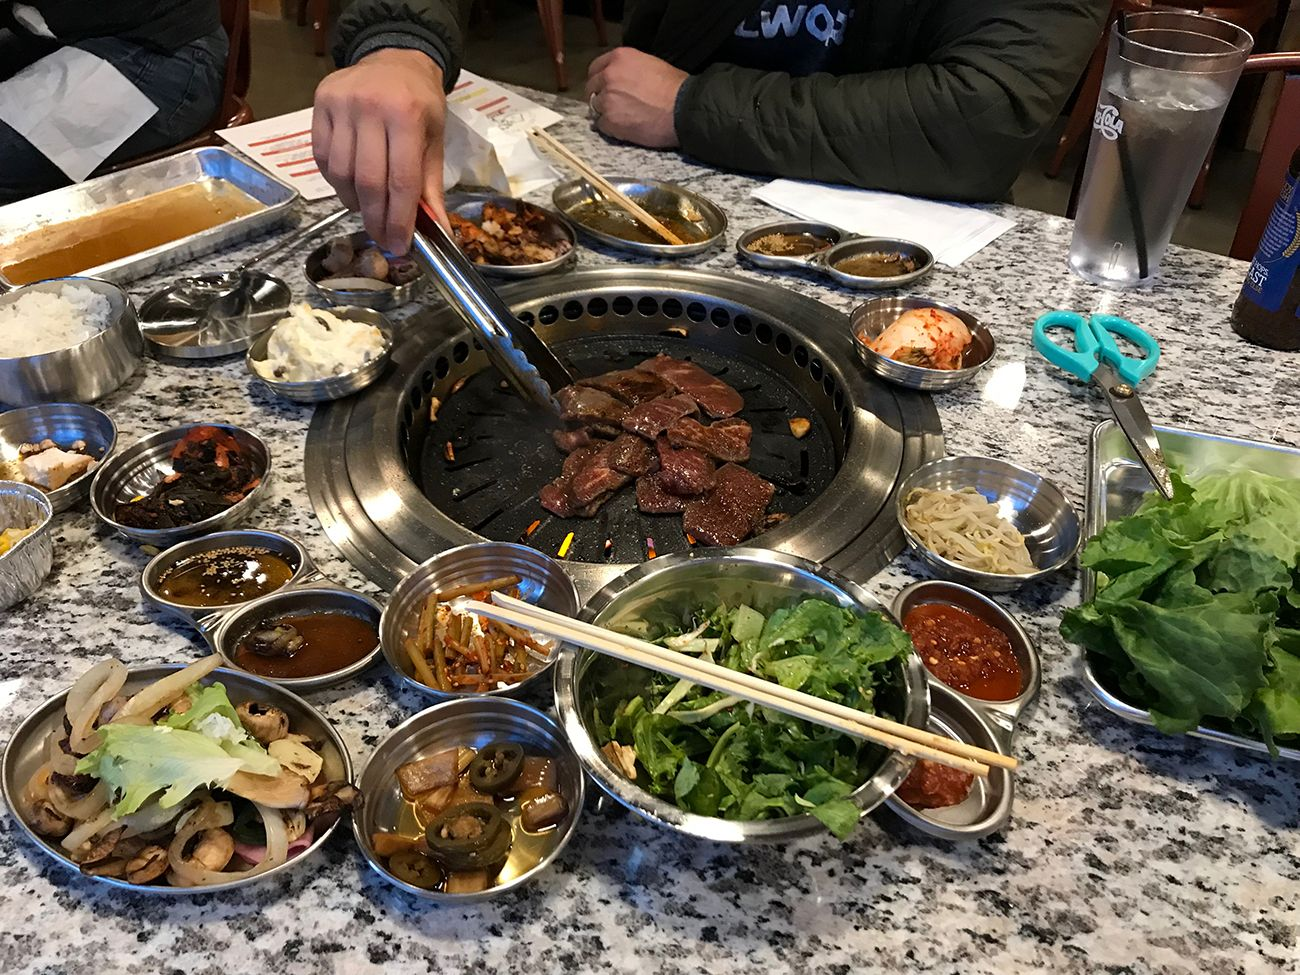 Yakiniku Ohji S New Japanese Charcoal Bbq And Salmon Buffet At Ang Mo Kio Eatbook Sg Food Wastage Food Street Food